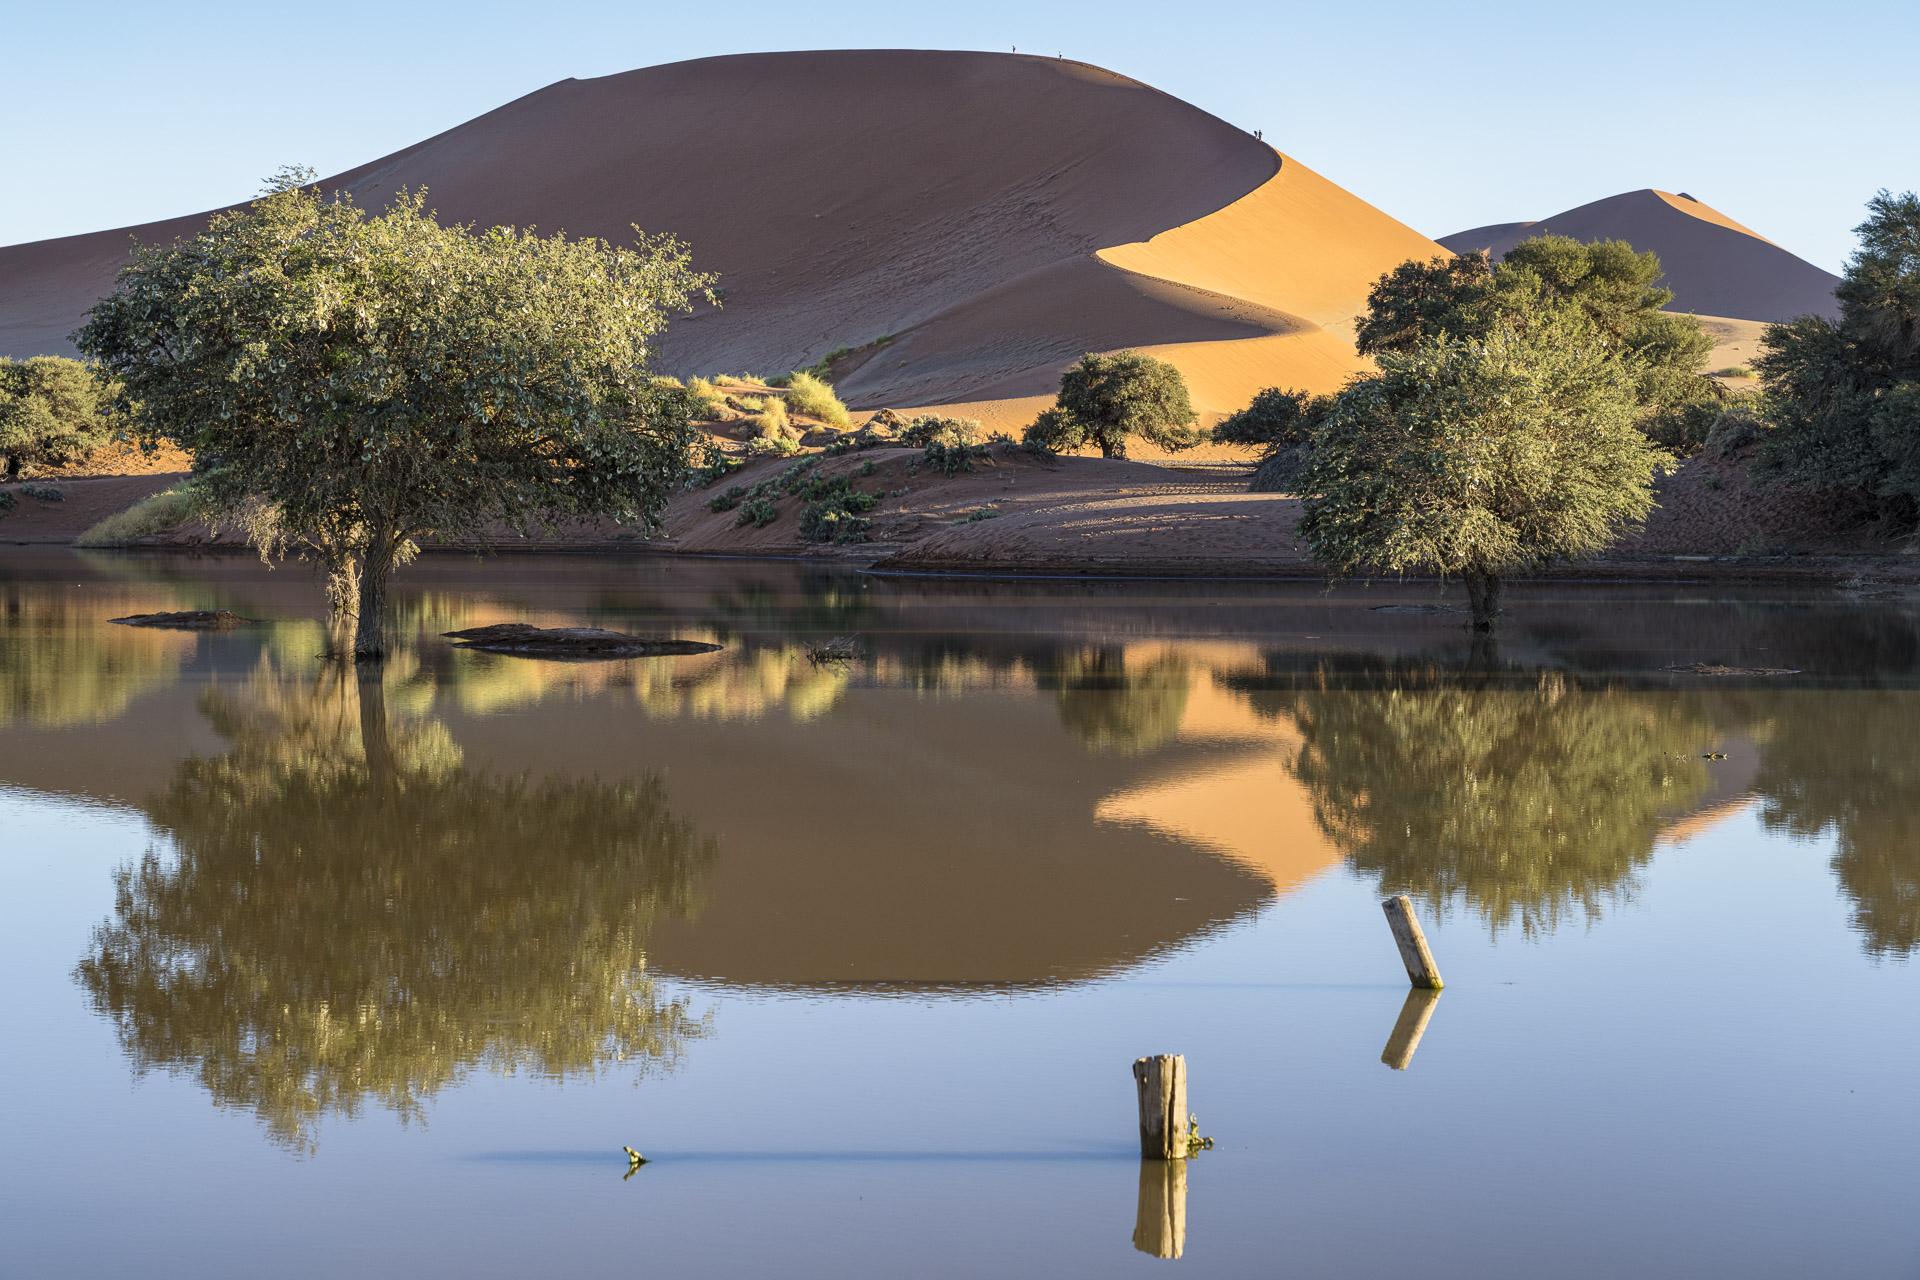 fotoreise-fotosafari-hd-2021-477-Namibia